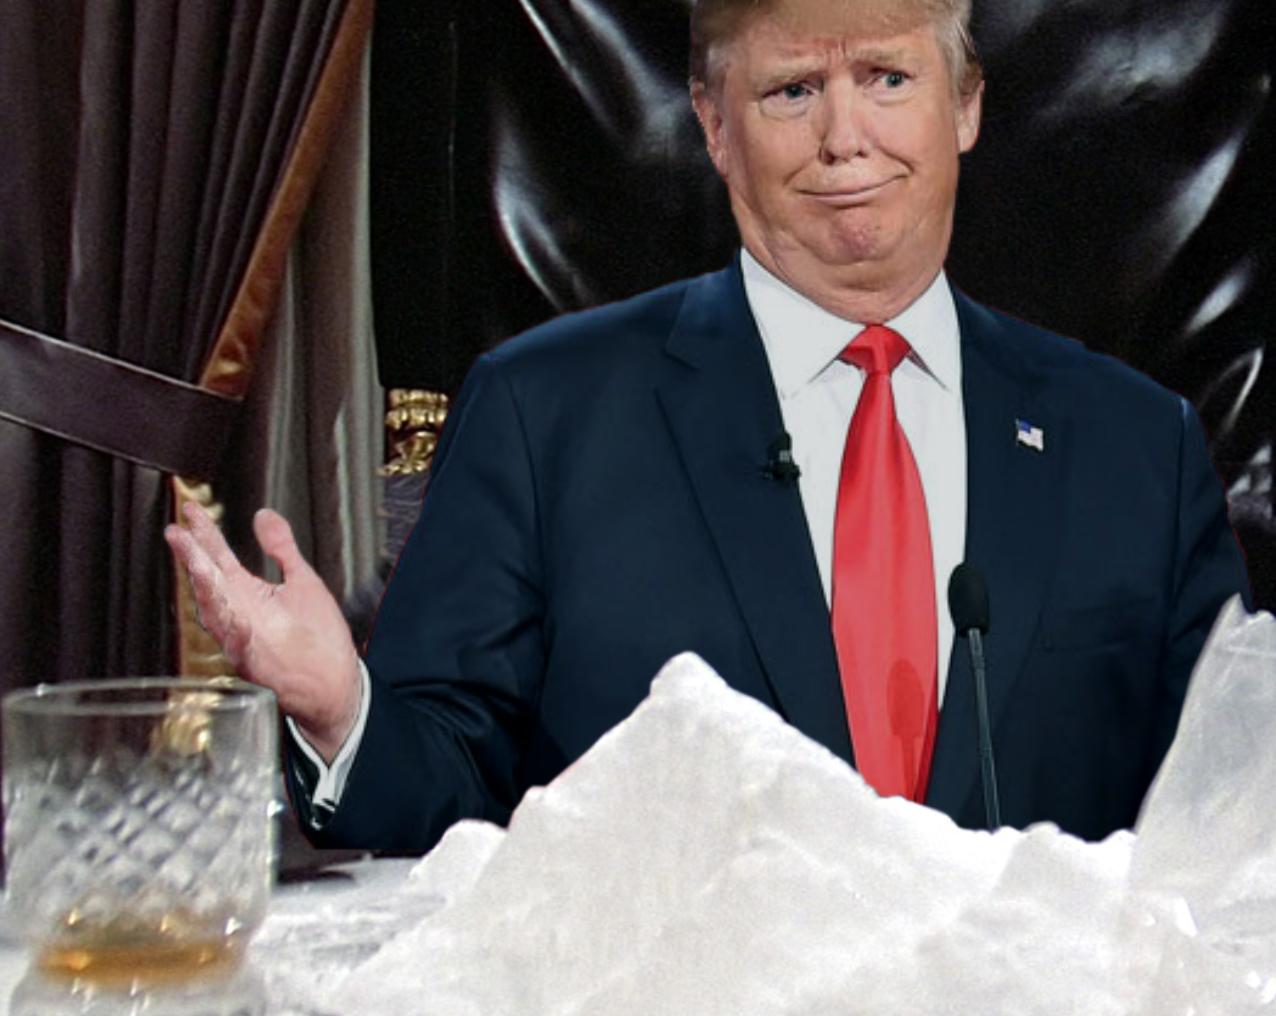 Donald Trump has a tremendous mountain of cocaine.